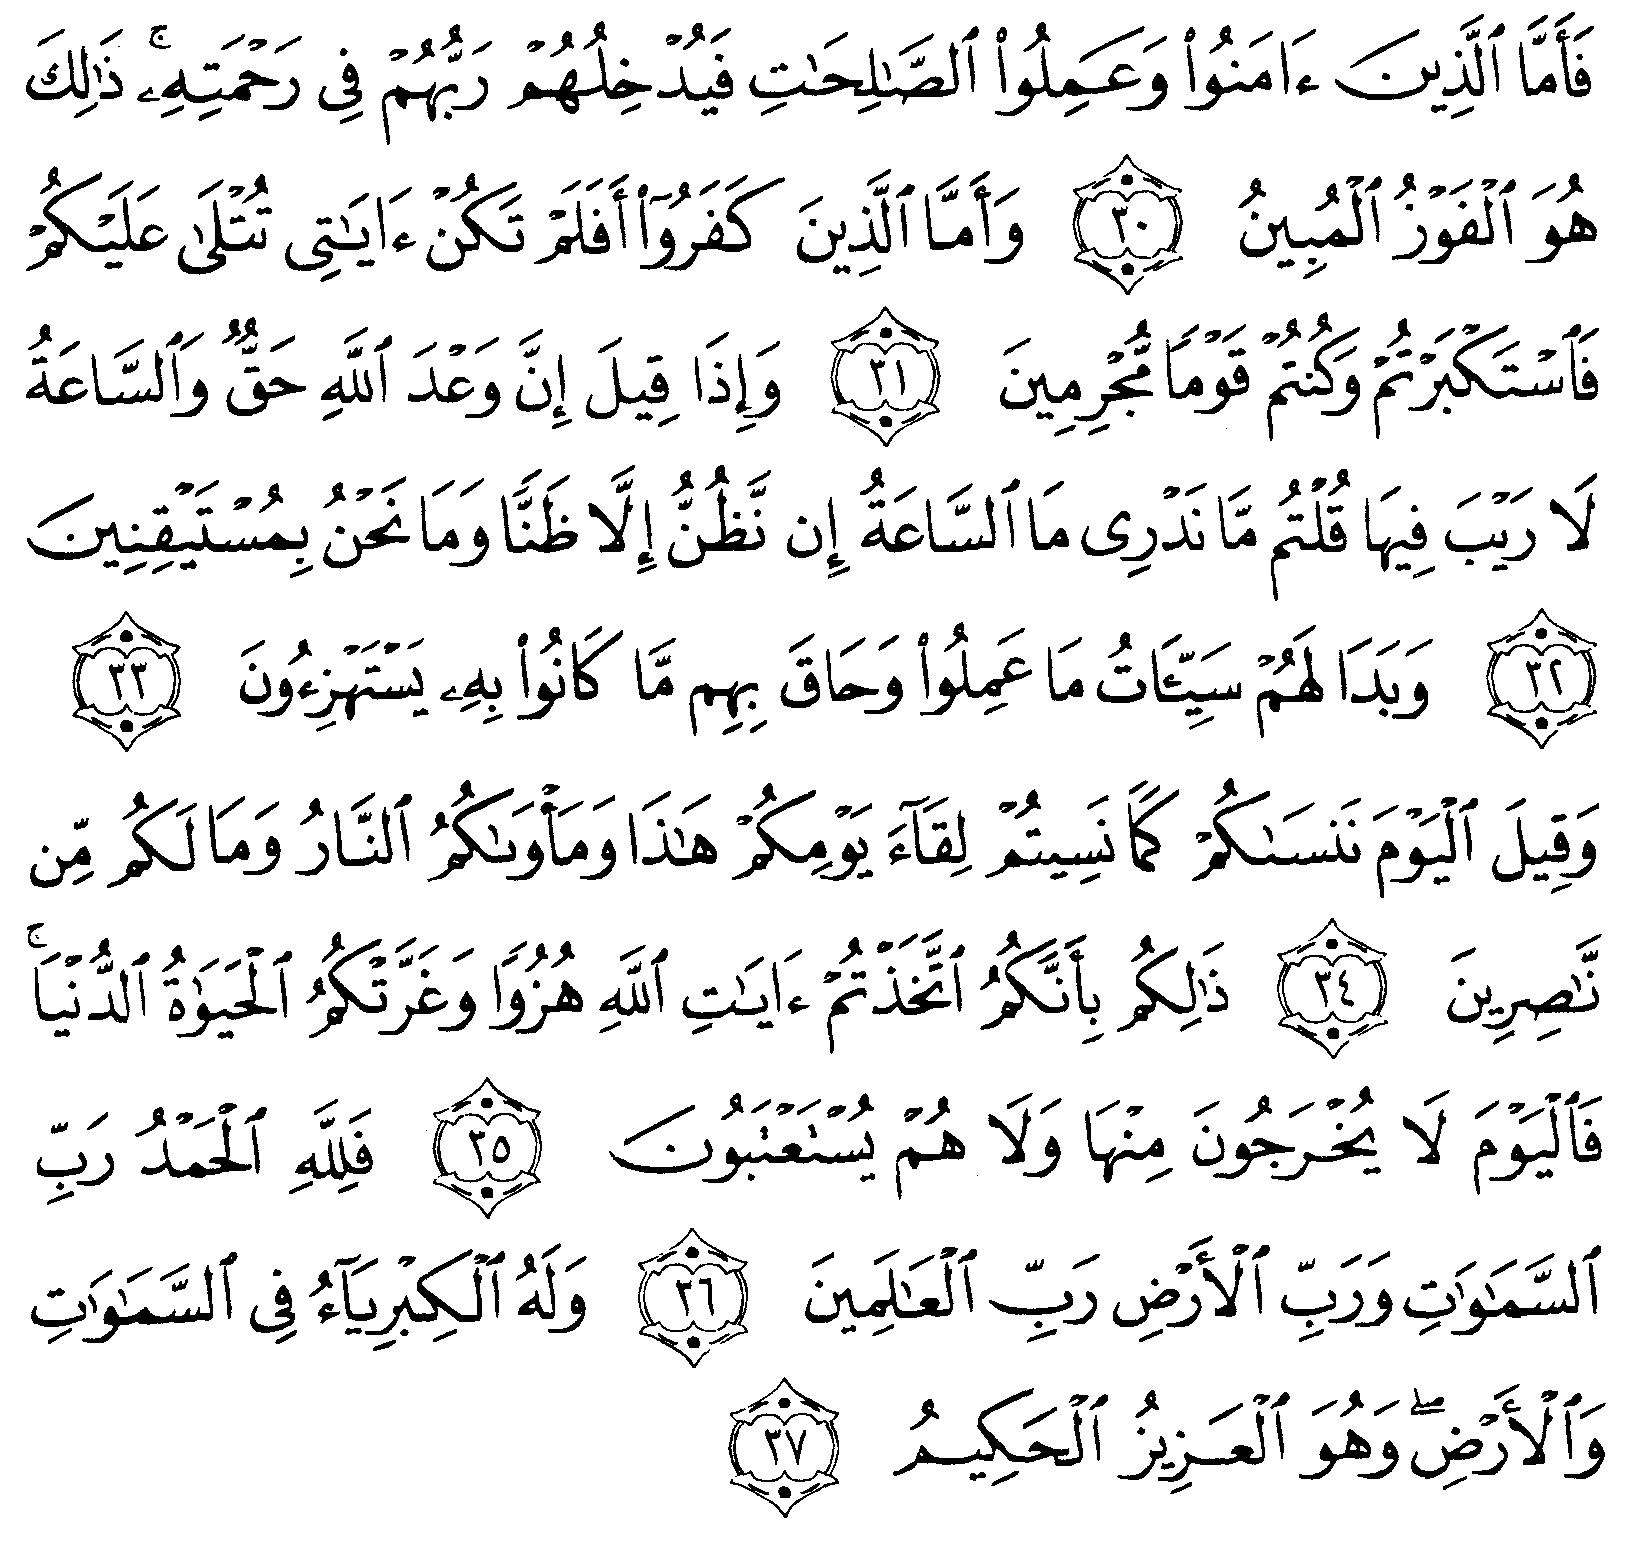 "tulisan arab alquran surat al jaatsiyah ayat 30 37 """